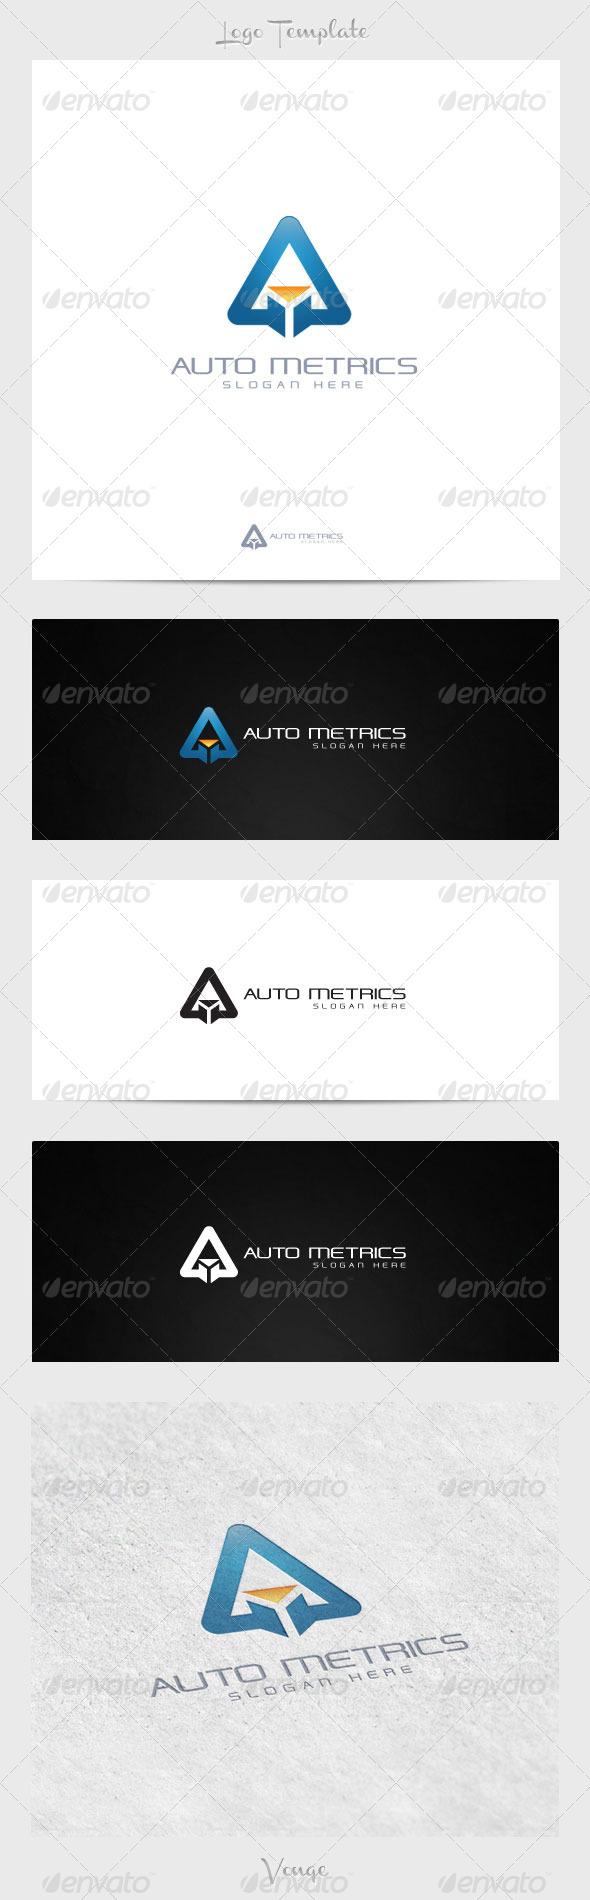 Auto Metric - Symbols Logo Templates